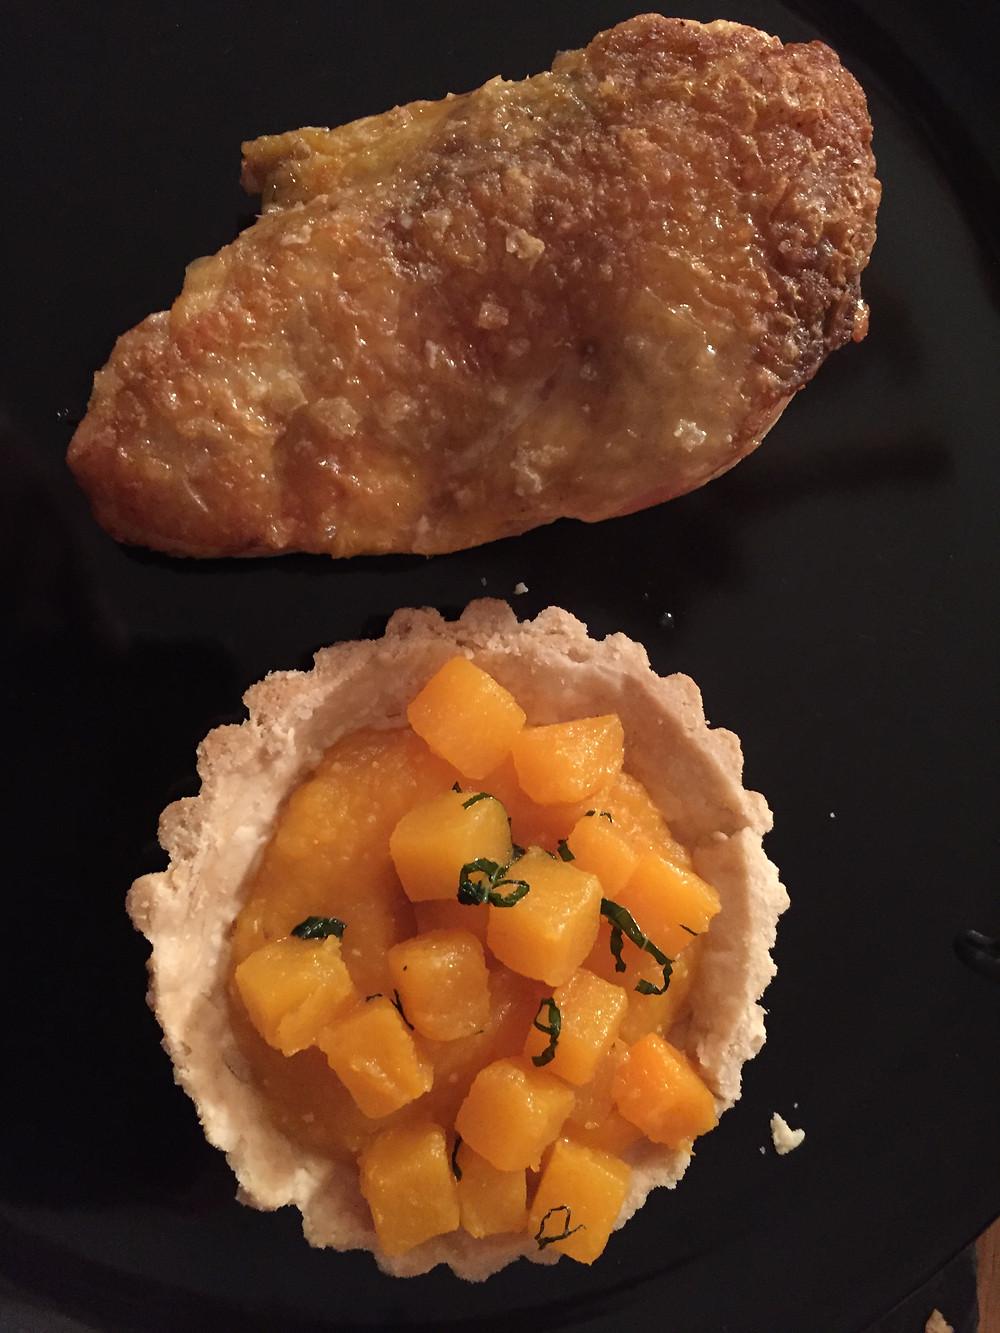 Pan roasted Guinea Fowl and Butternut Squash tart